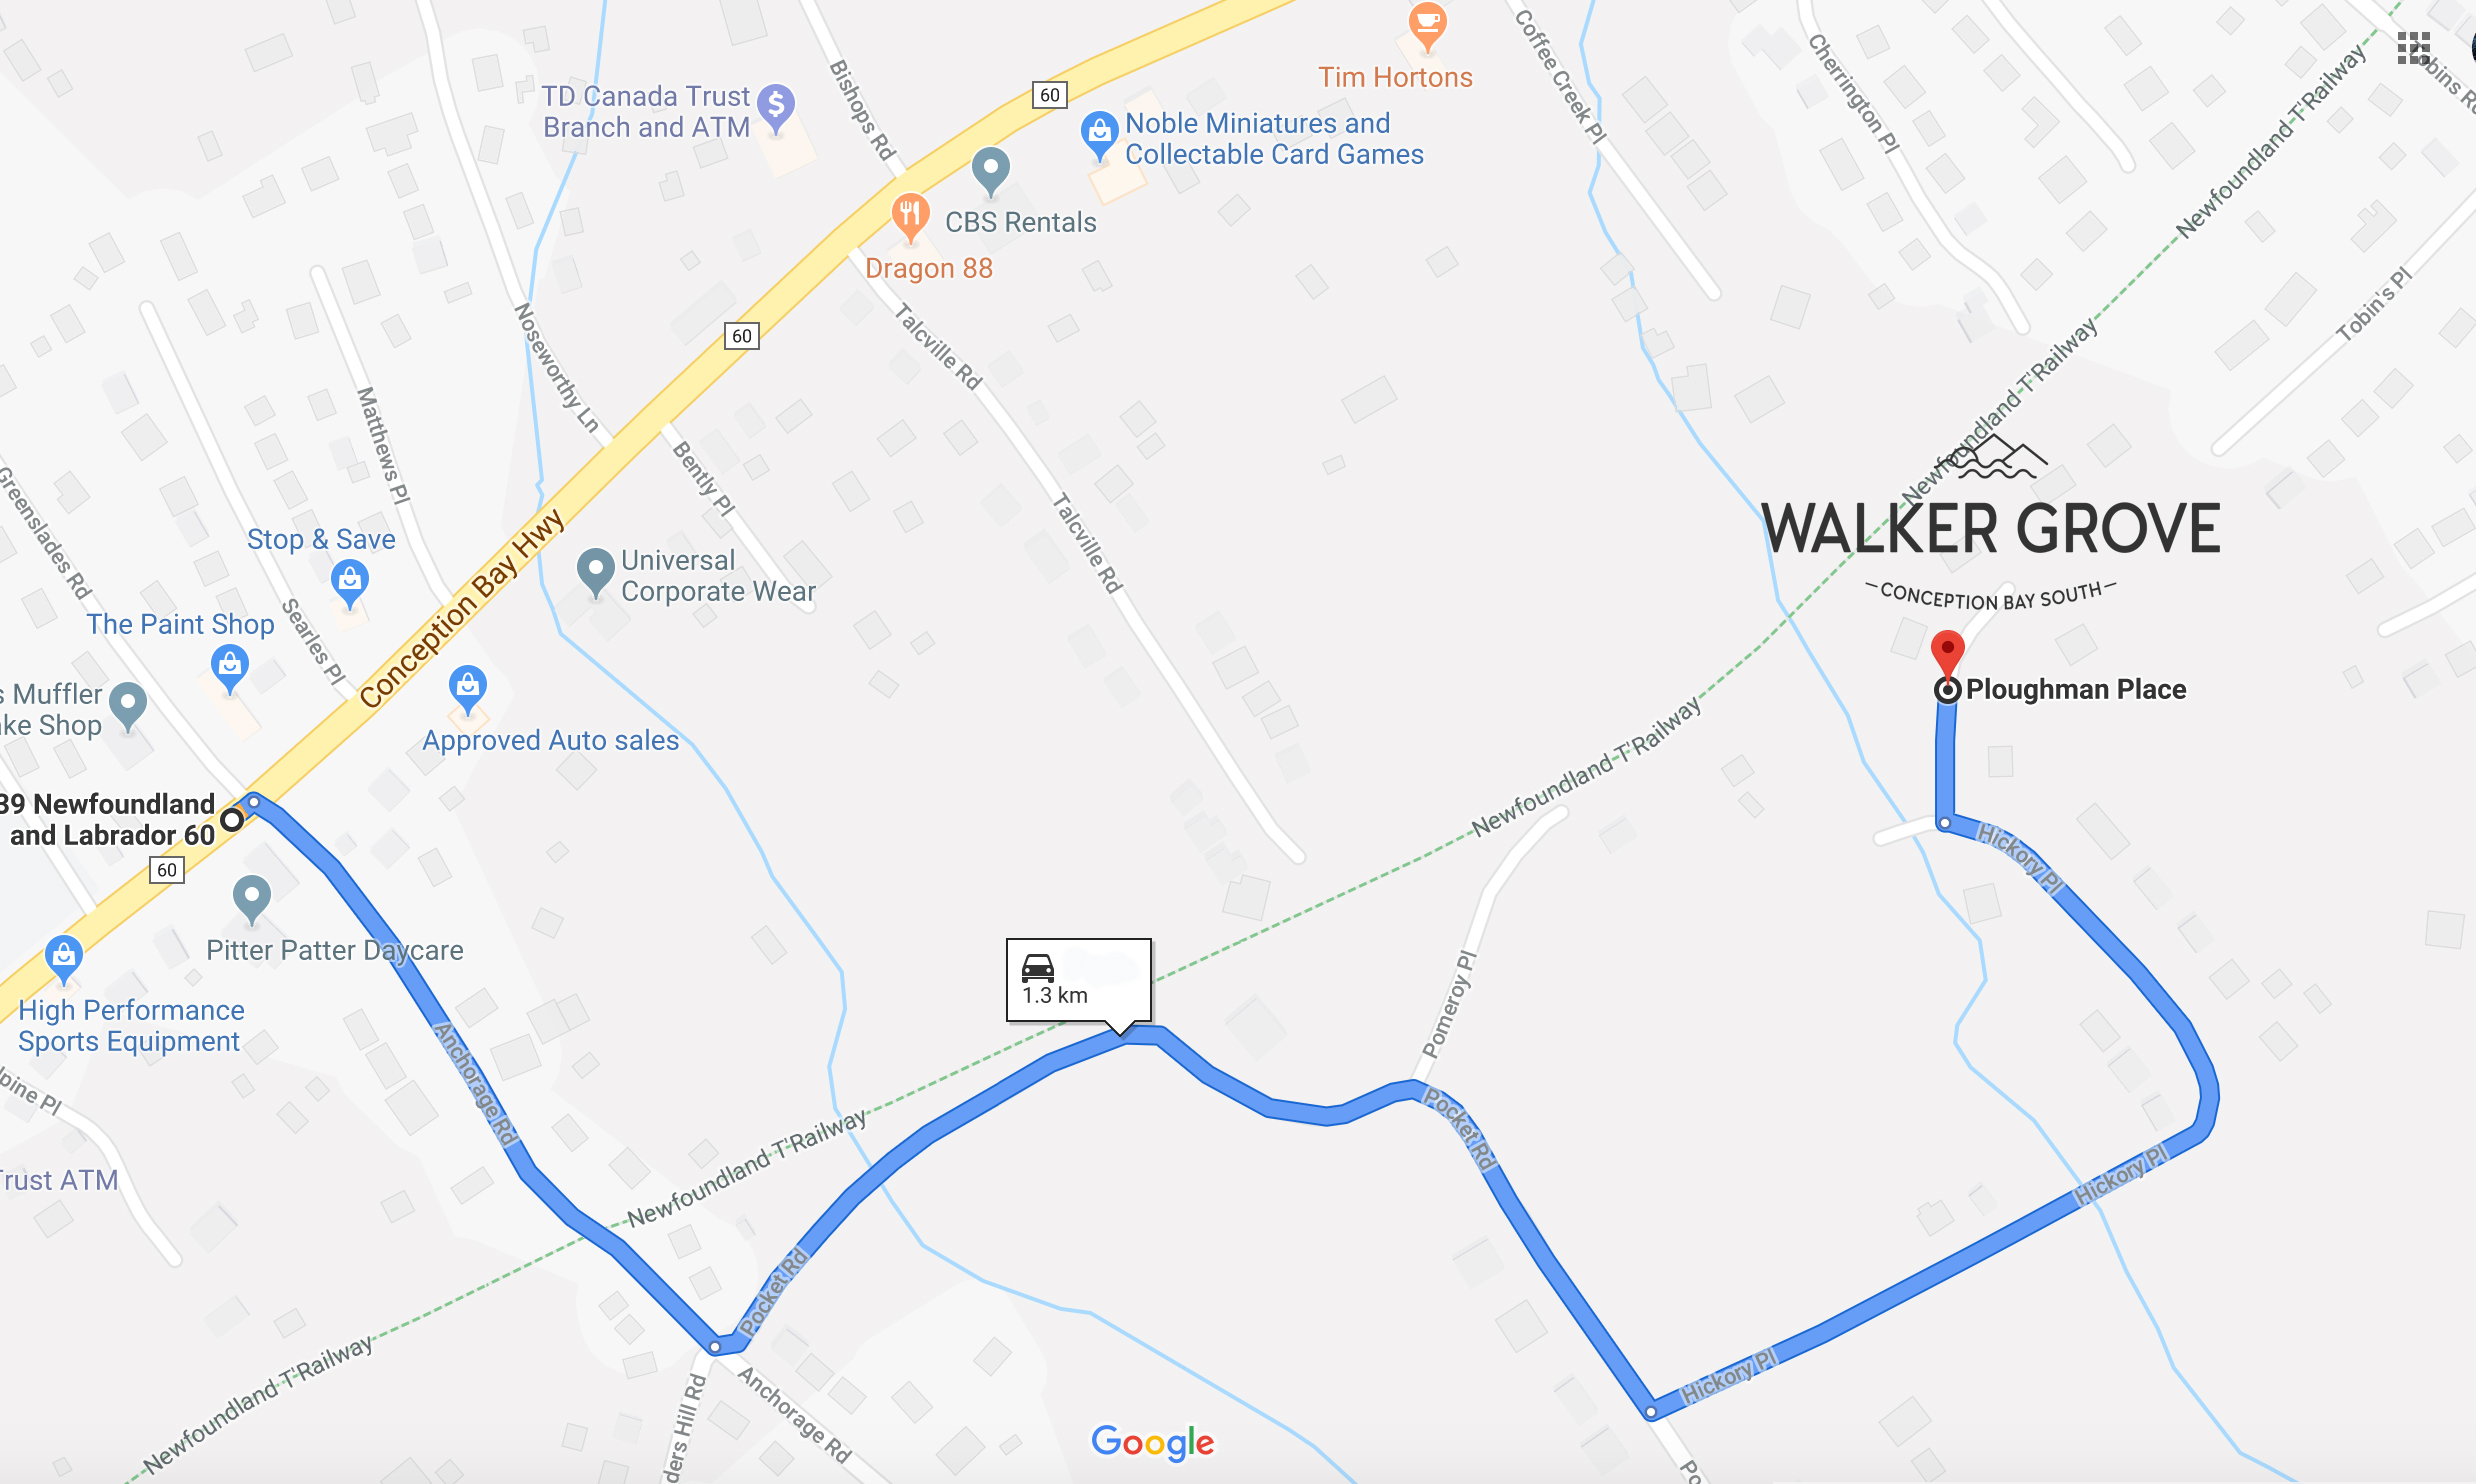 Walker Grove Location